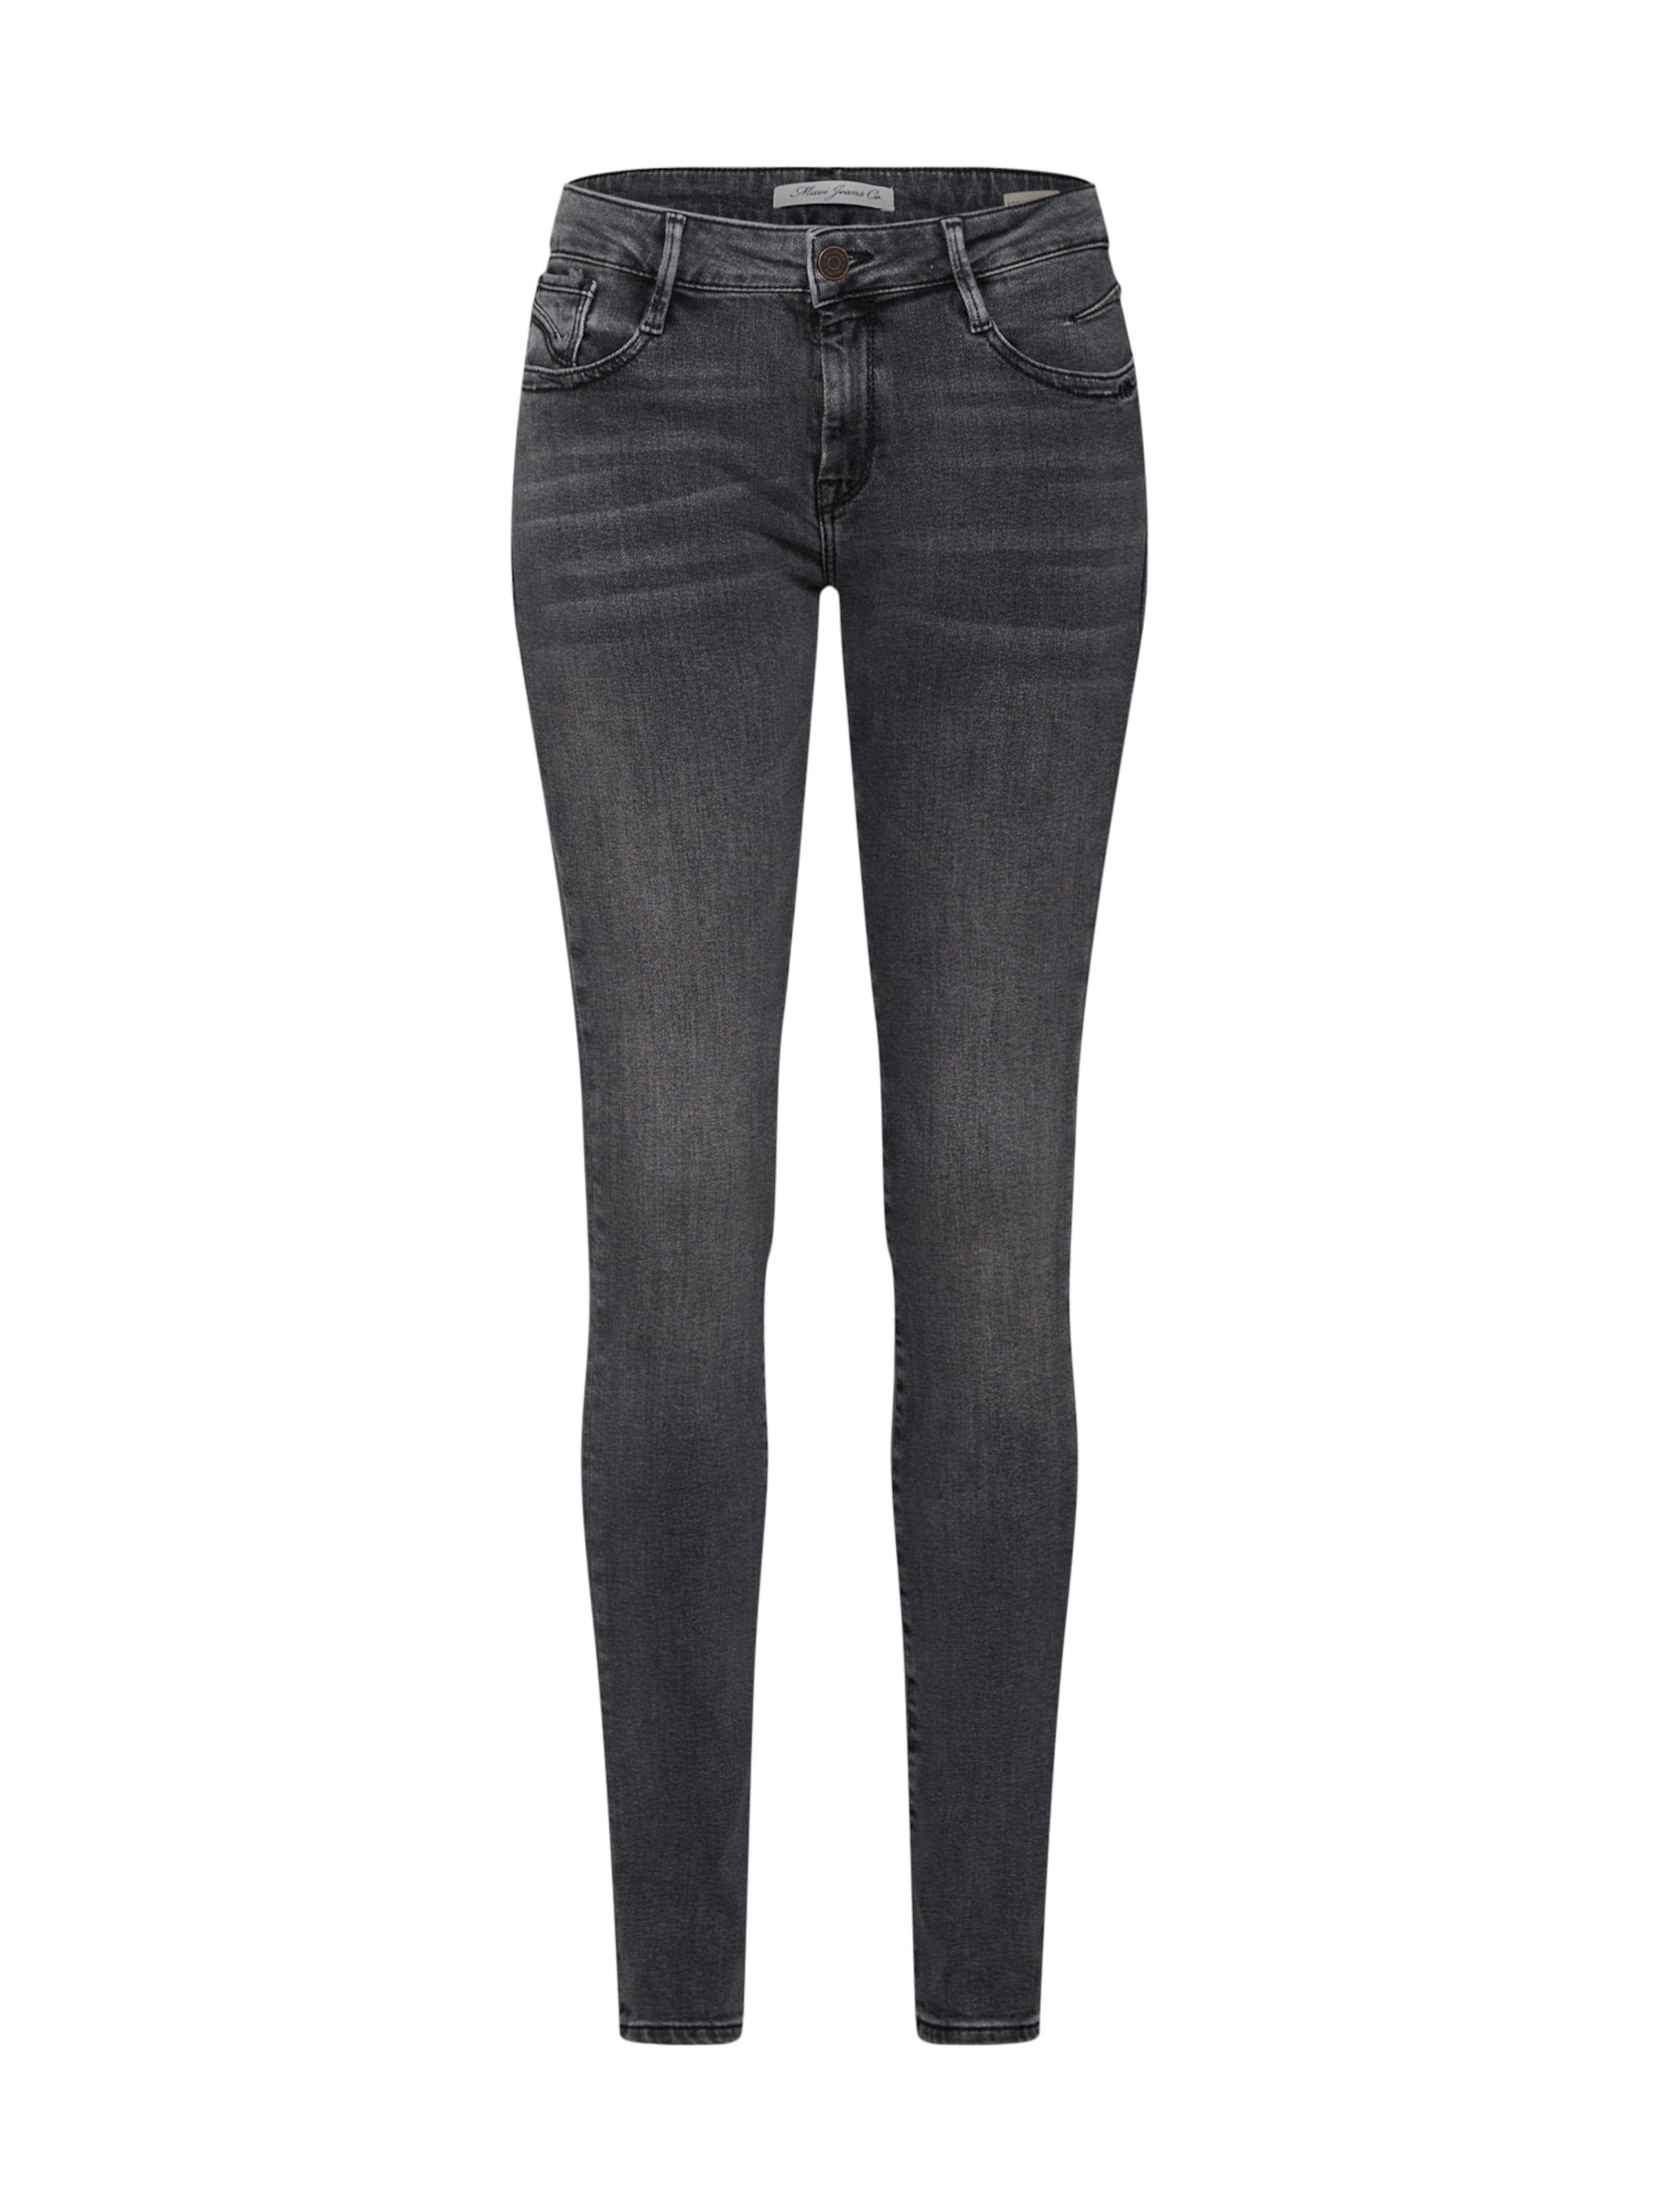 'adriana' Dunkelgrau Mavi In Jeans EH9beIWD2Y